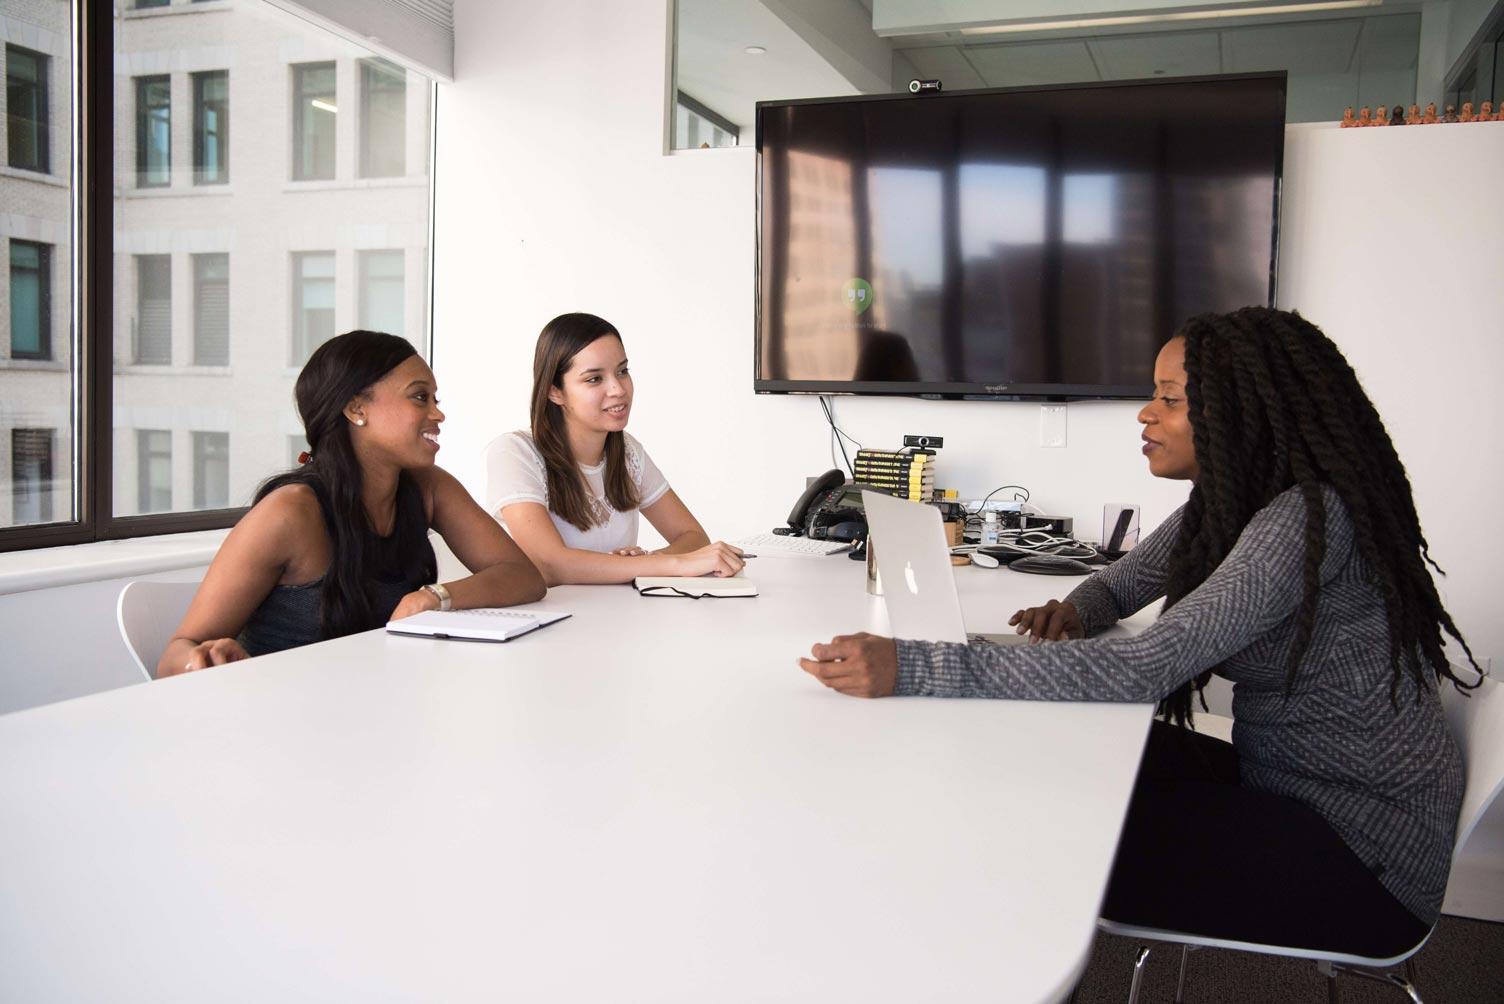 technical job interview tips